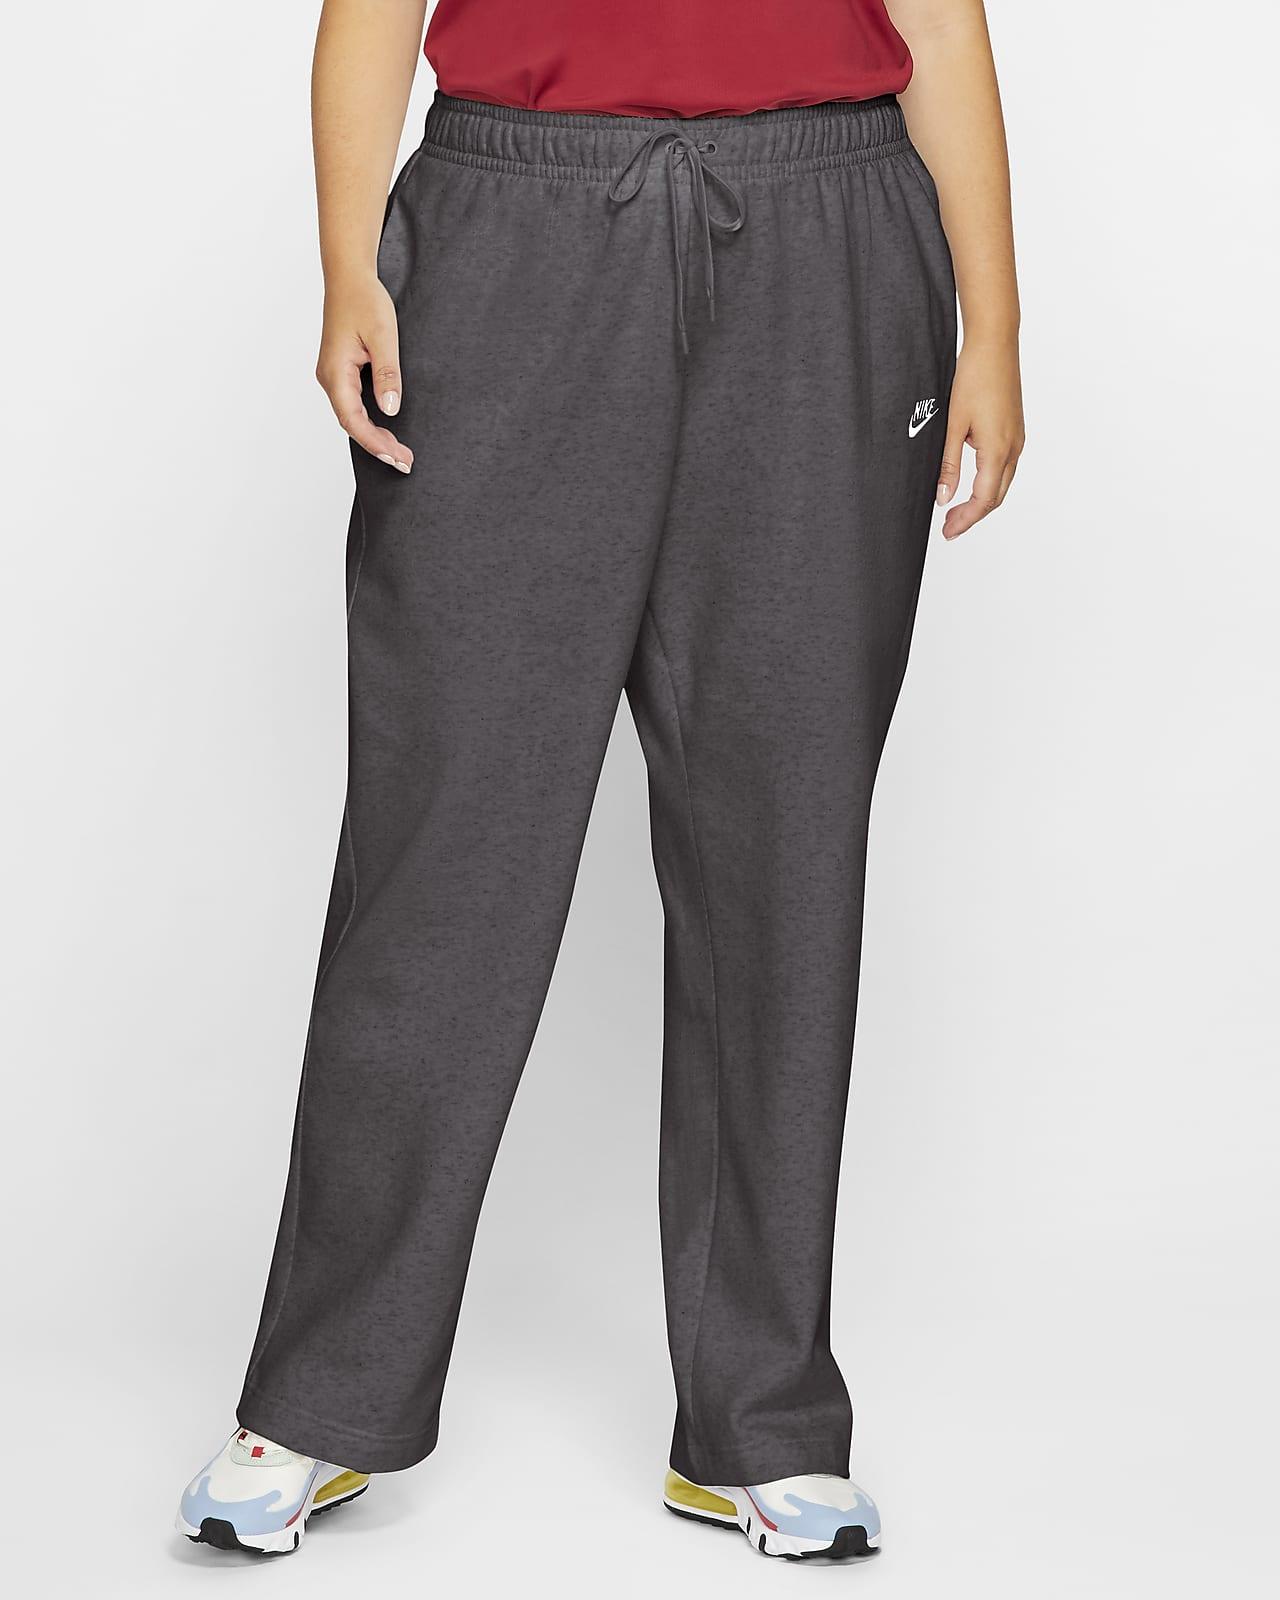 Pantalones para mujer (talla grande) Nike Sportswear Club Fleece